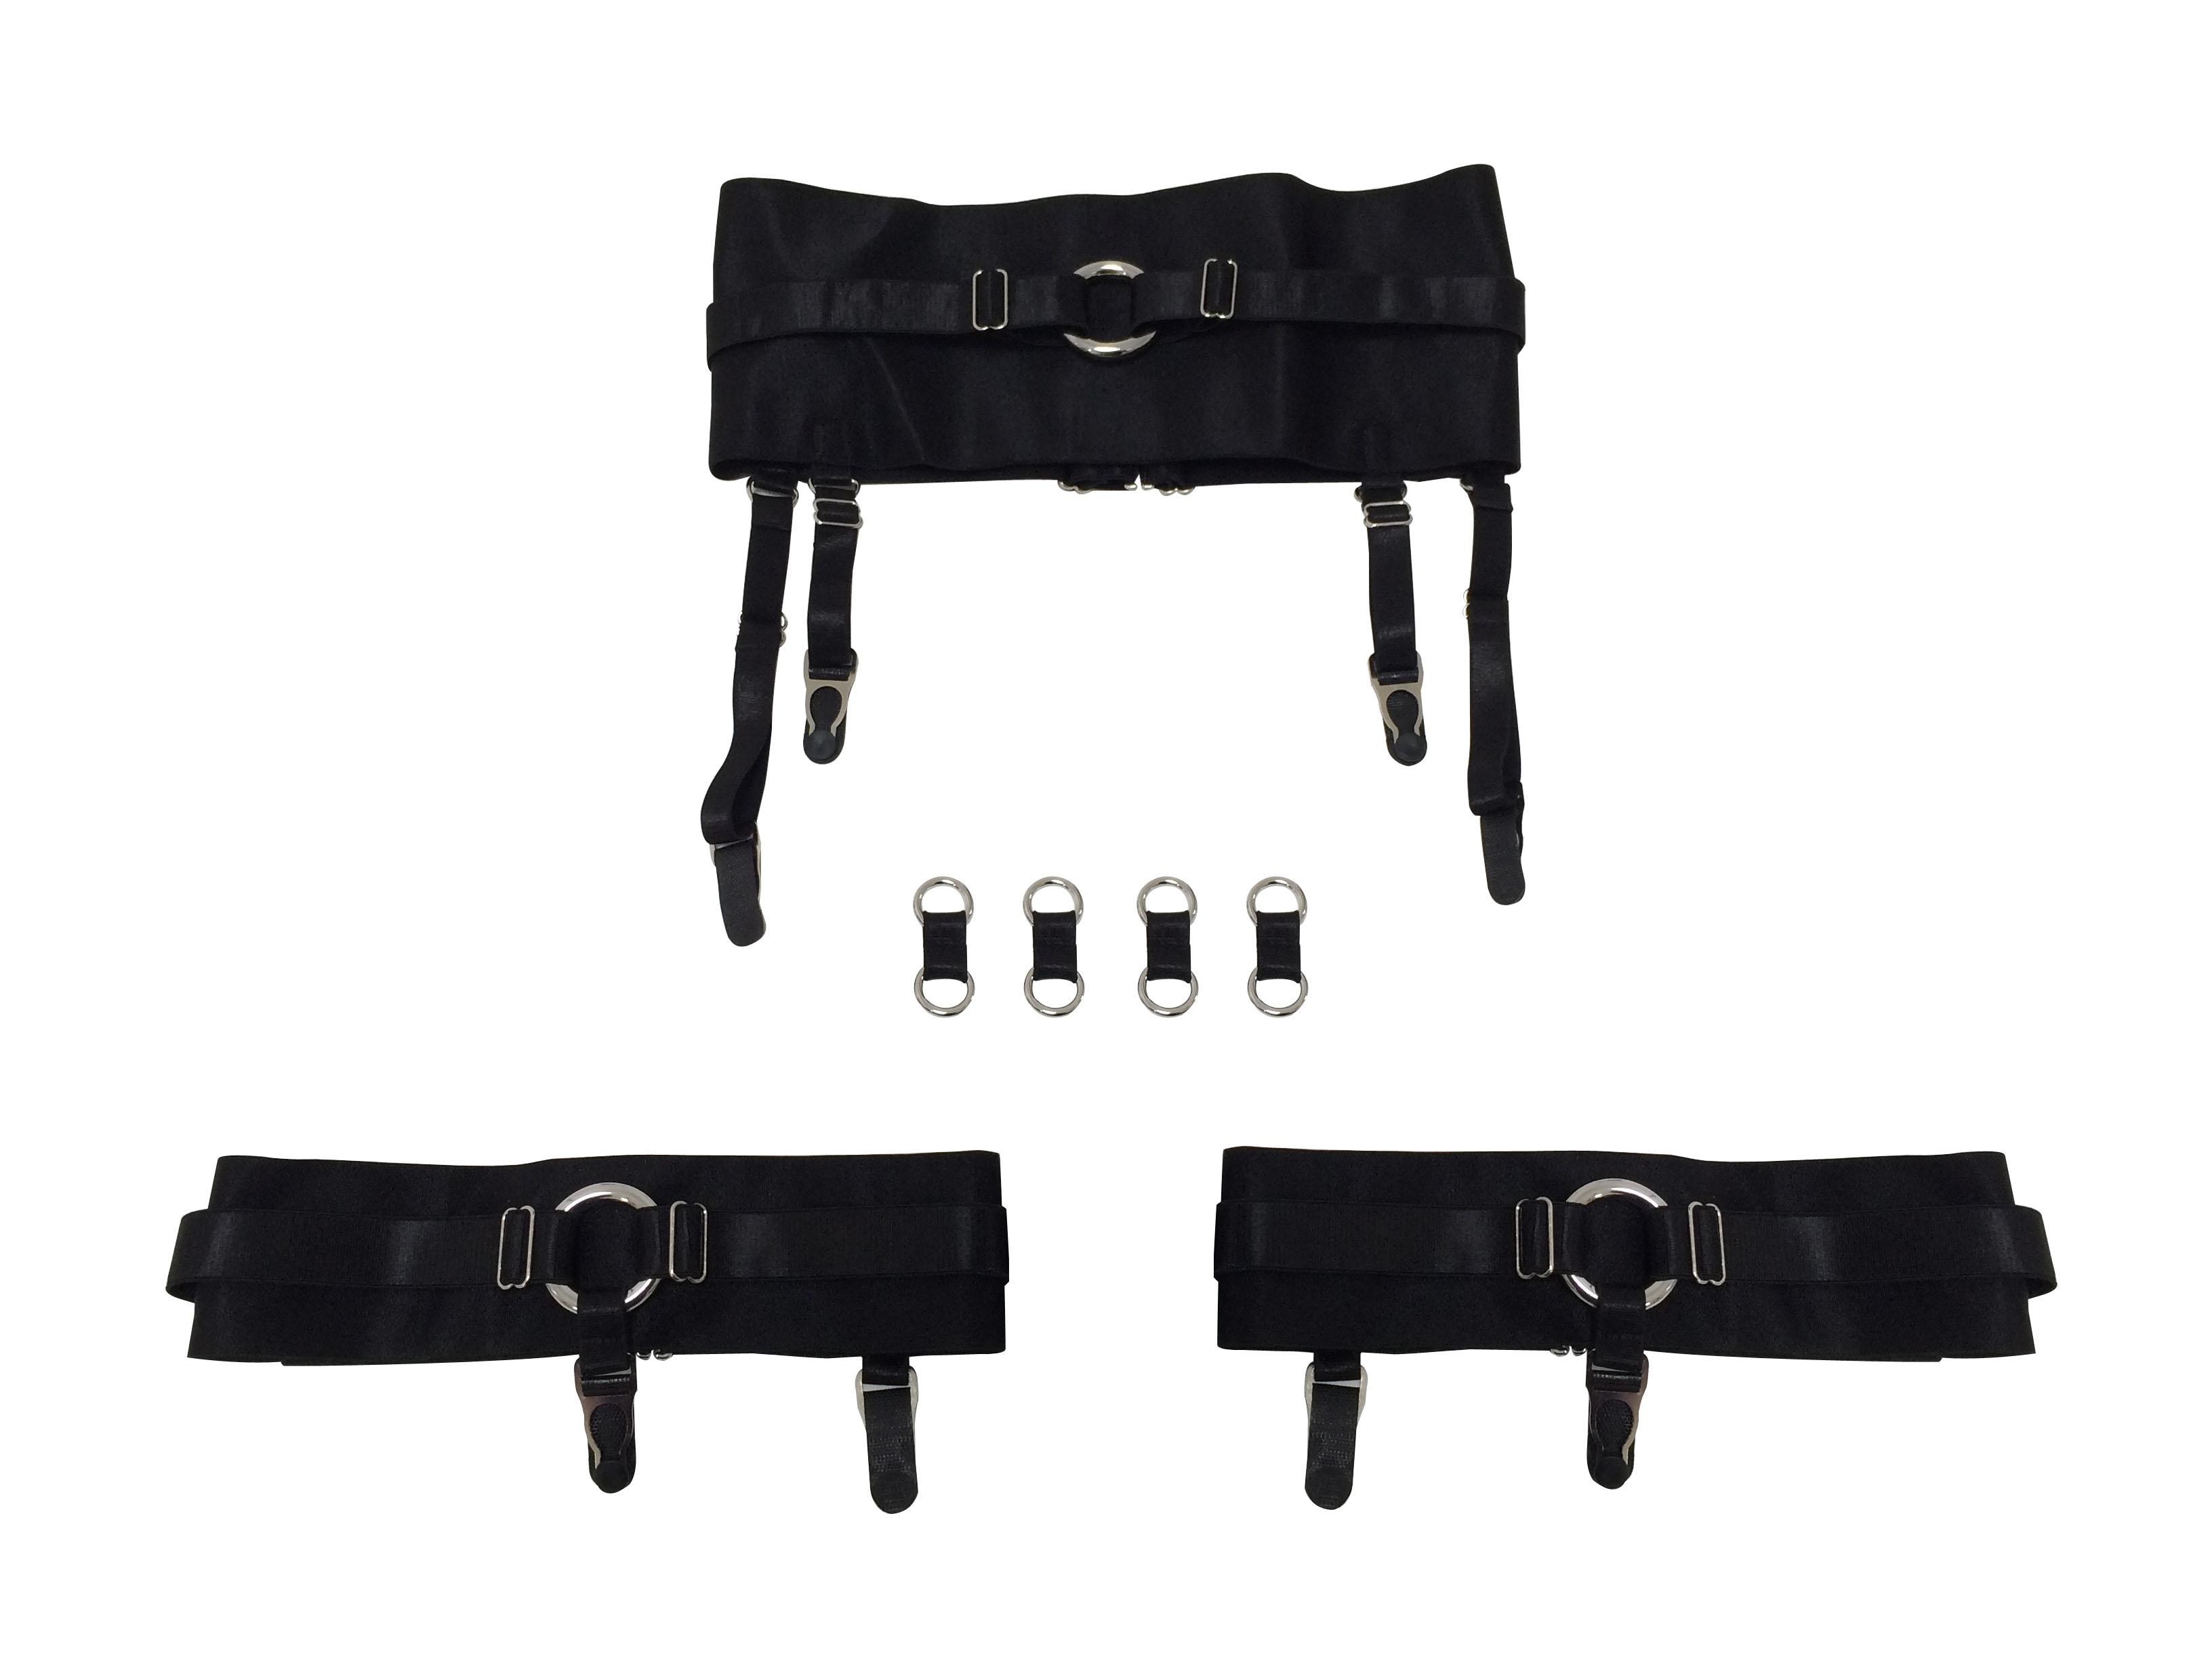 3c58d92a4 Fenti Garter Belt ( Black ) · CREEPYYEHA · Online Store Powered by ...